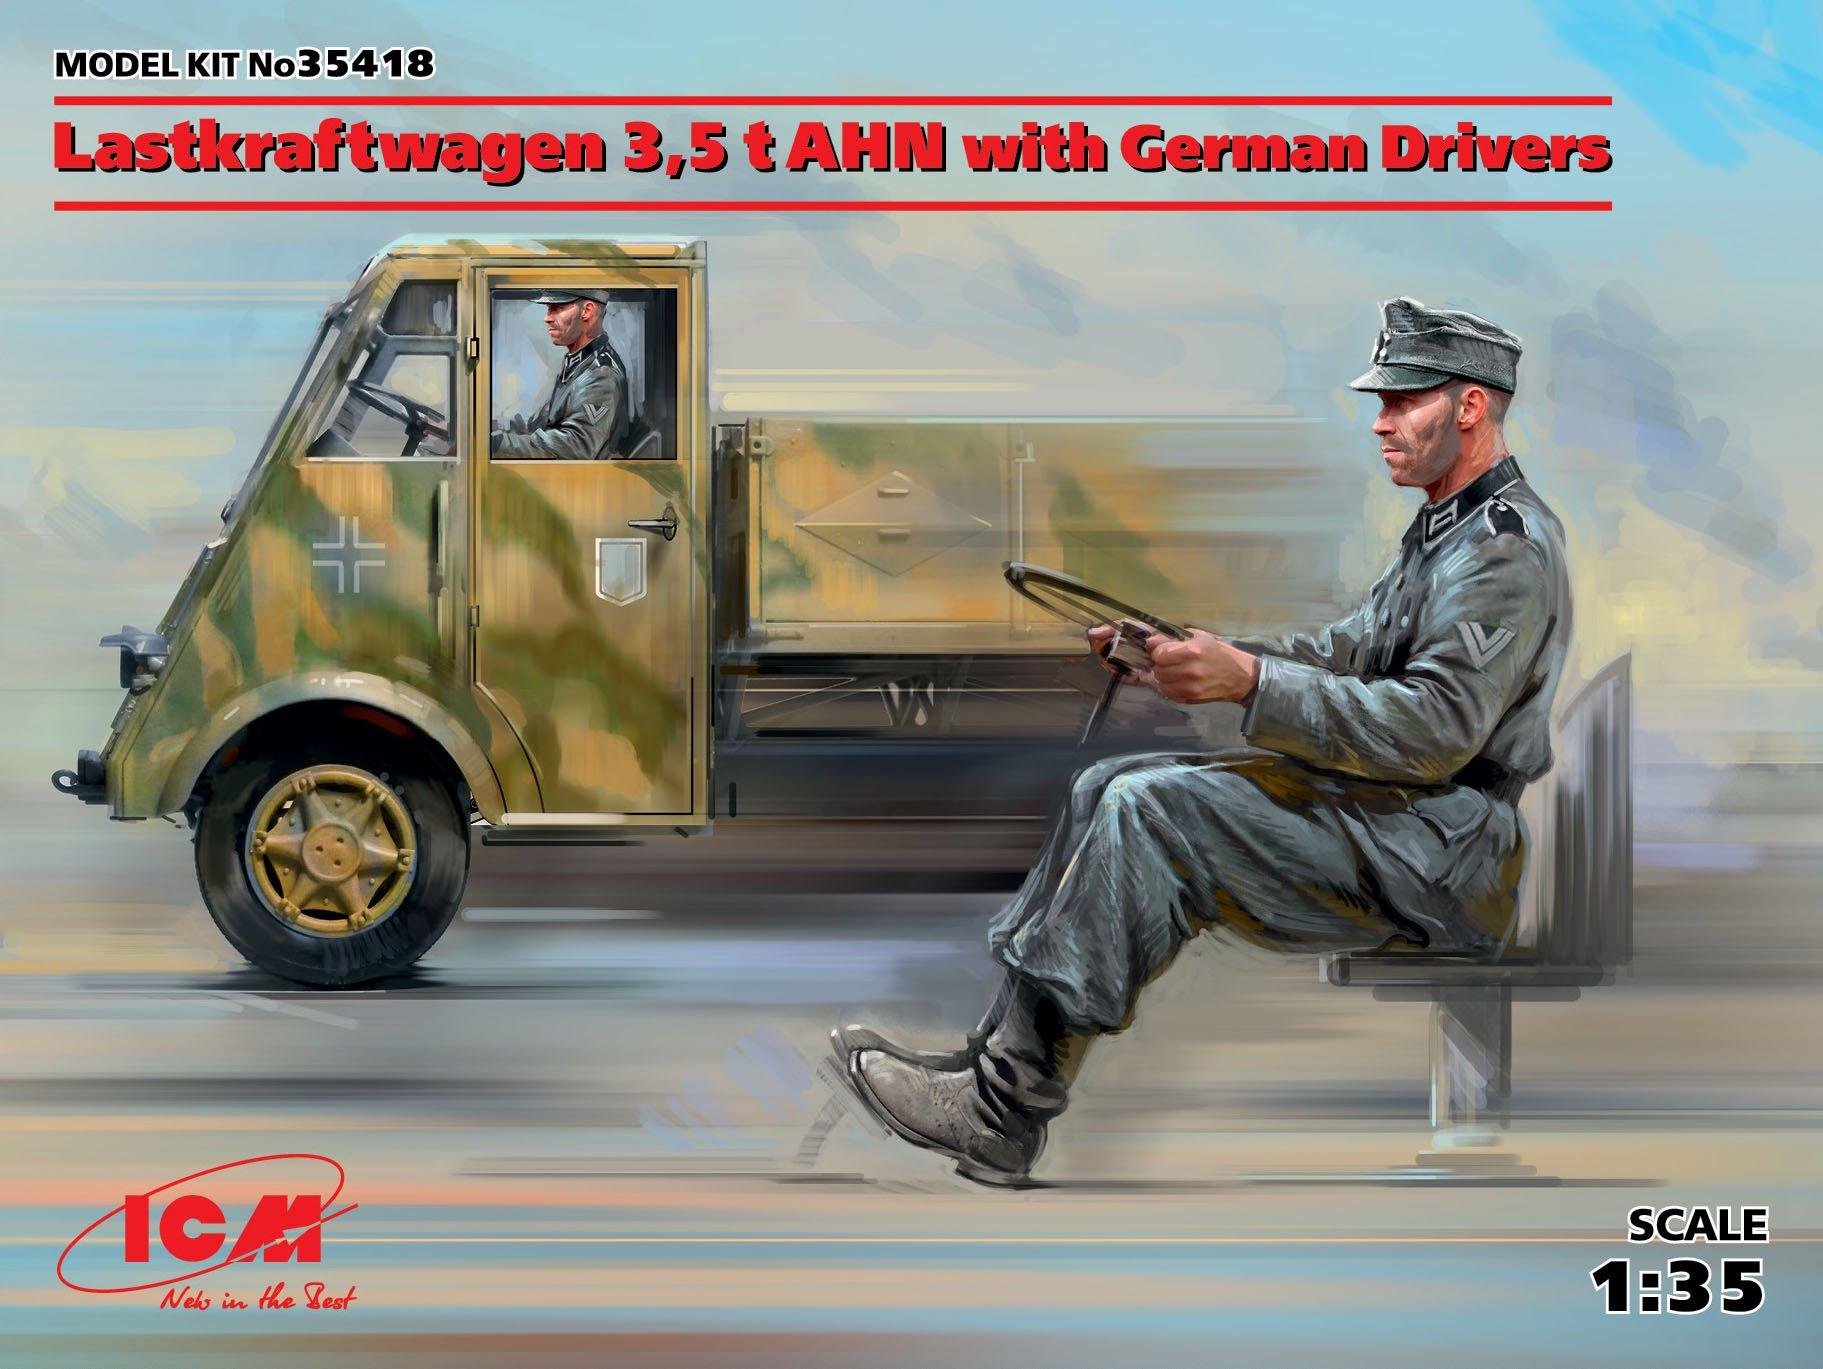 ICM 1/35 Lastkraftwagen 3,5 t AHN with German Drivers